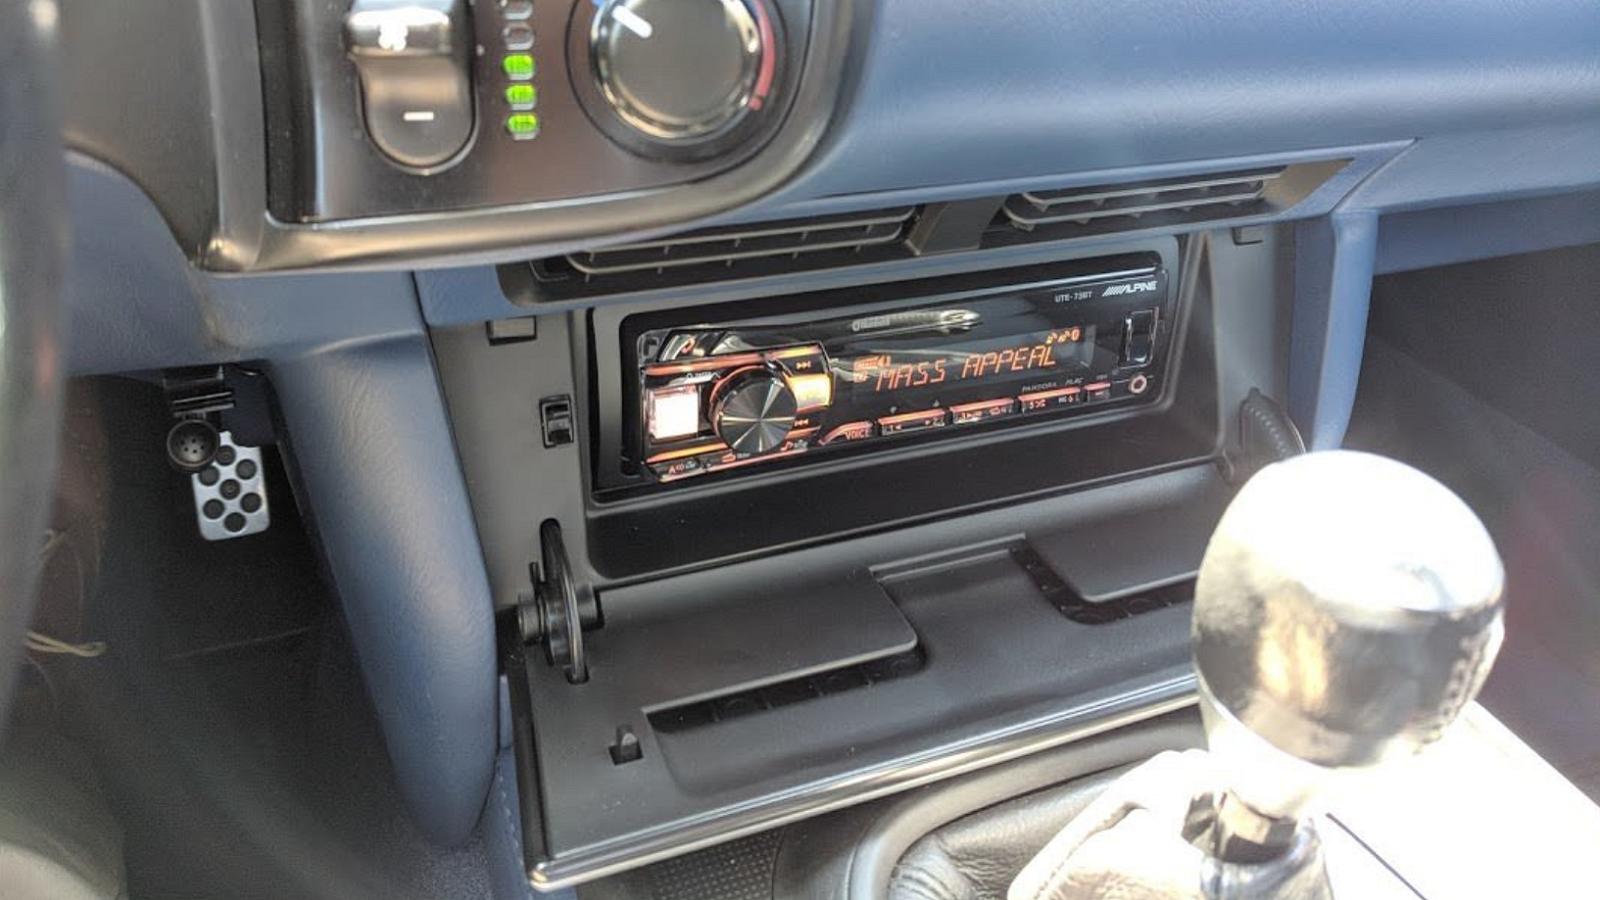 Suzuka Blue AP1 Packs Major Audio Upgrades